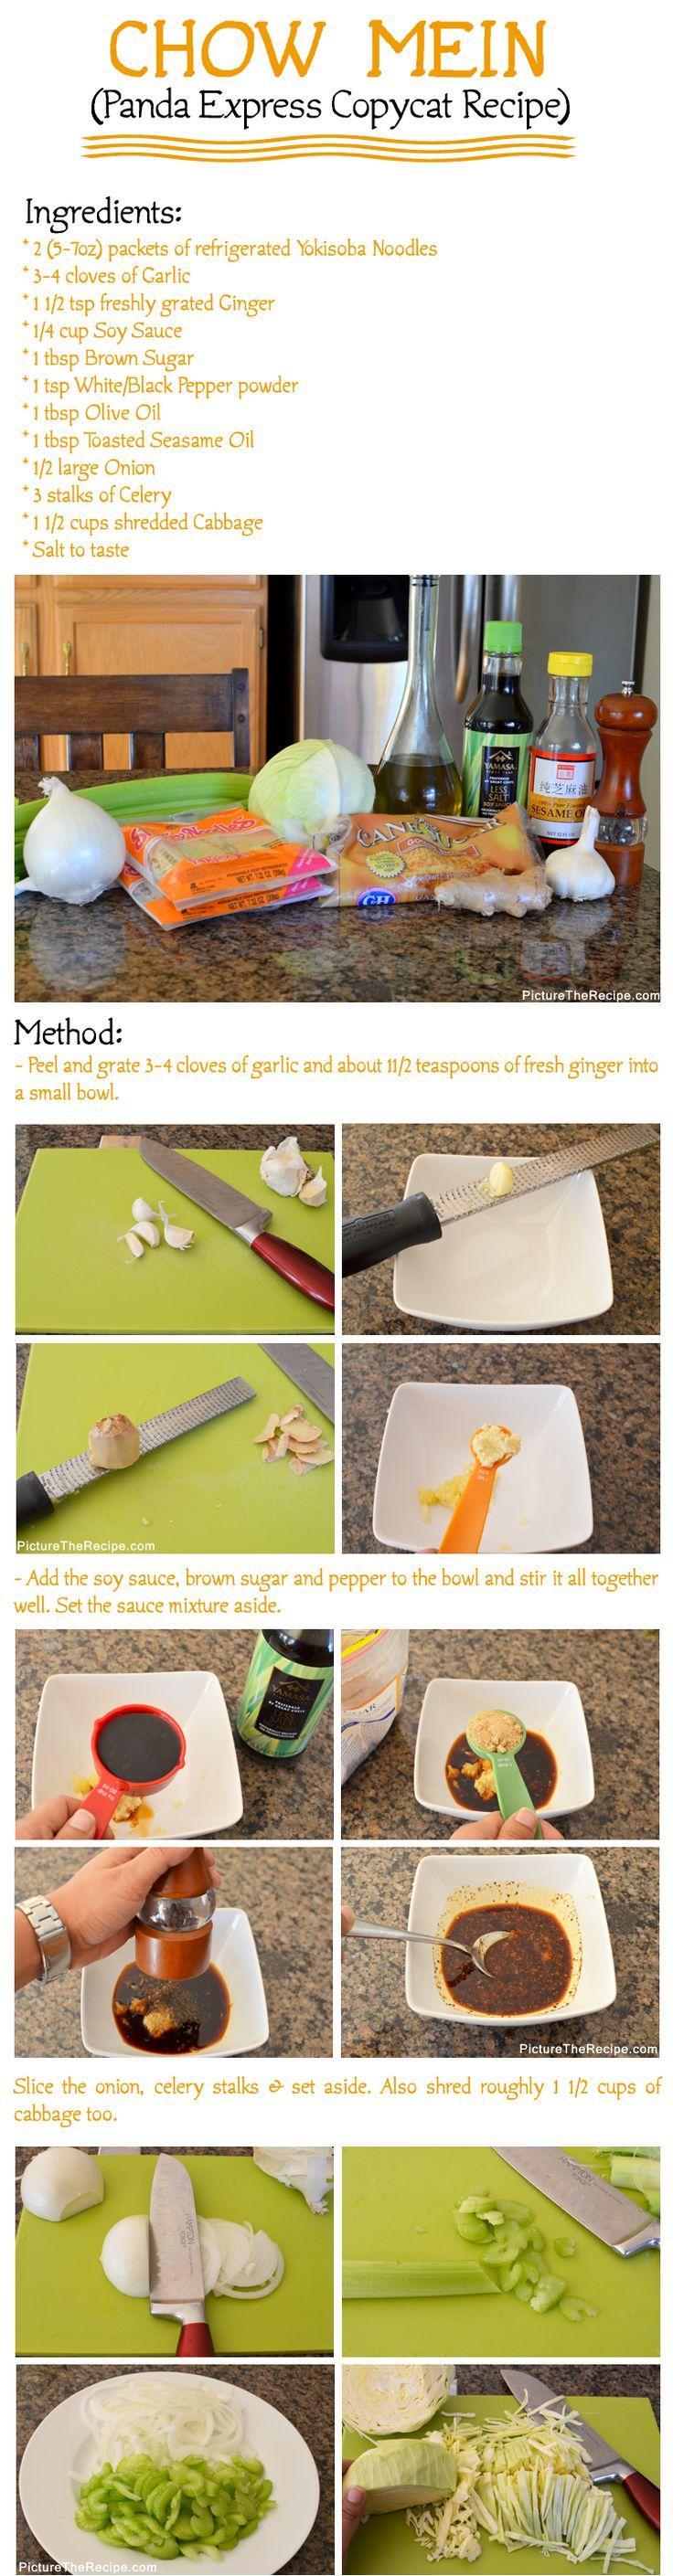 Chow Mein (Panda Express Copycat Recipe) Part-1